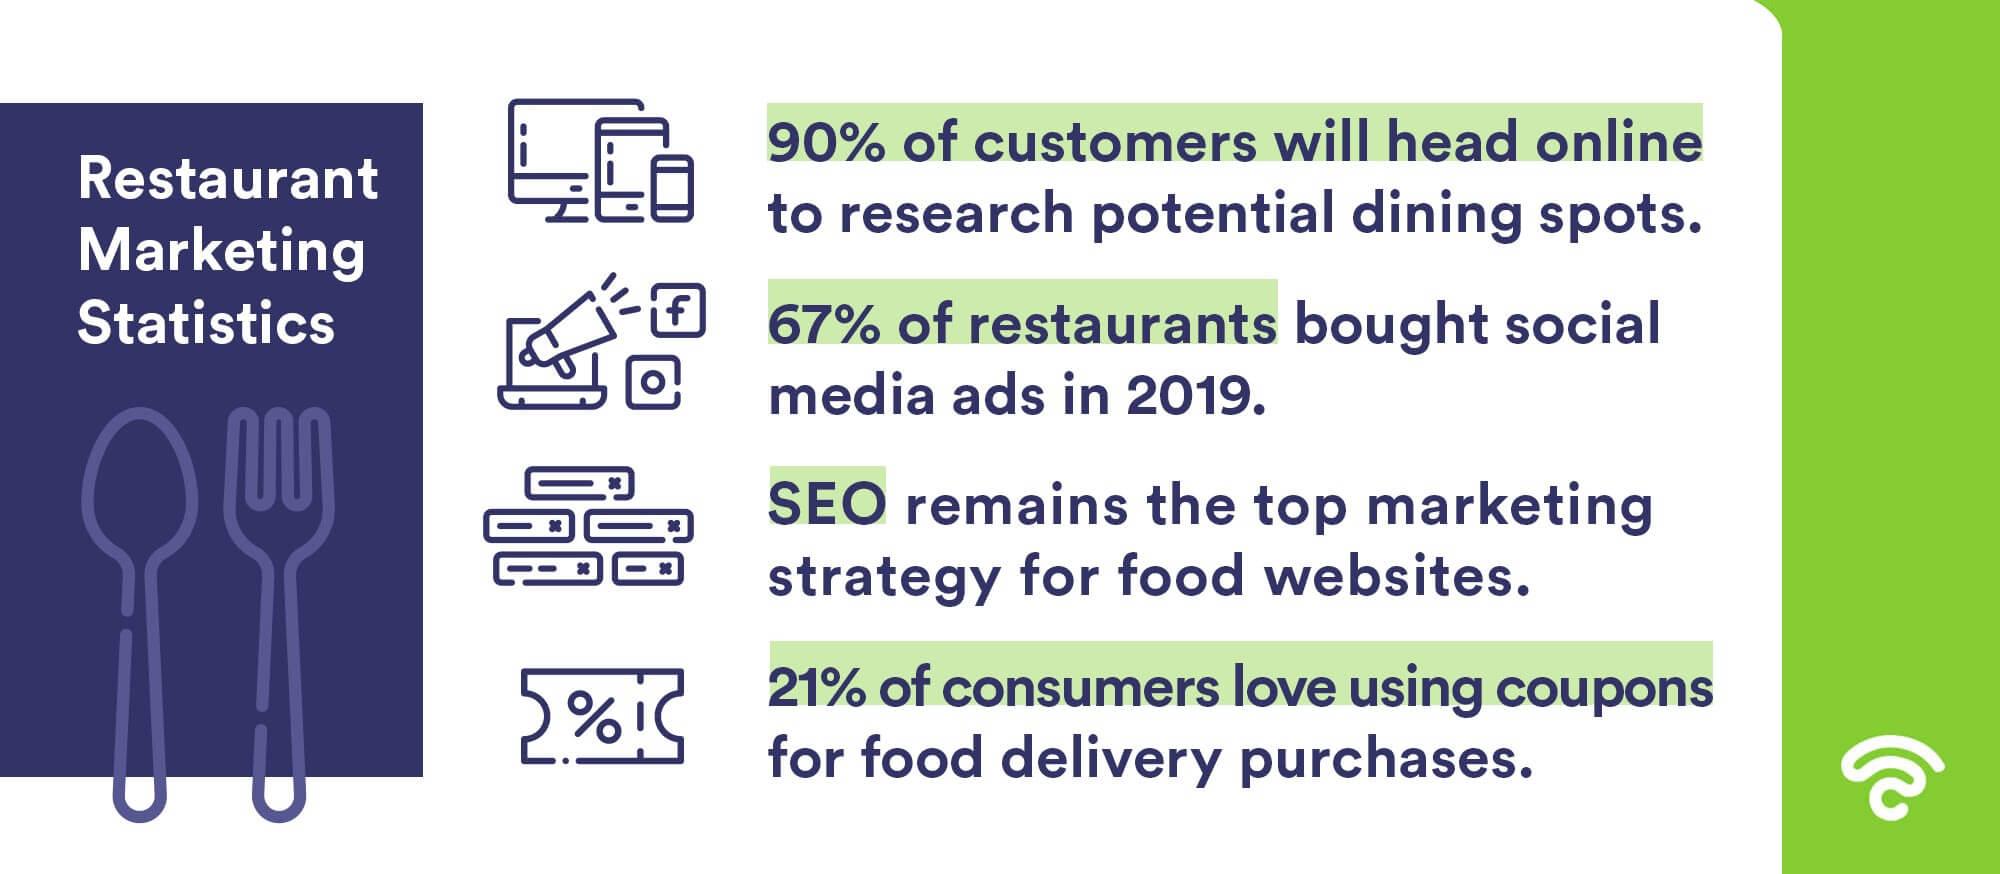 Restaurant marketing statistics